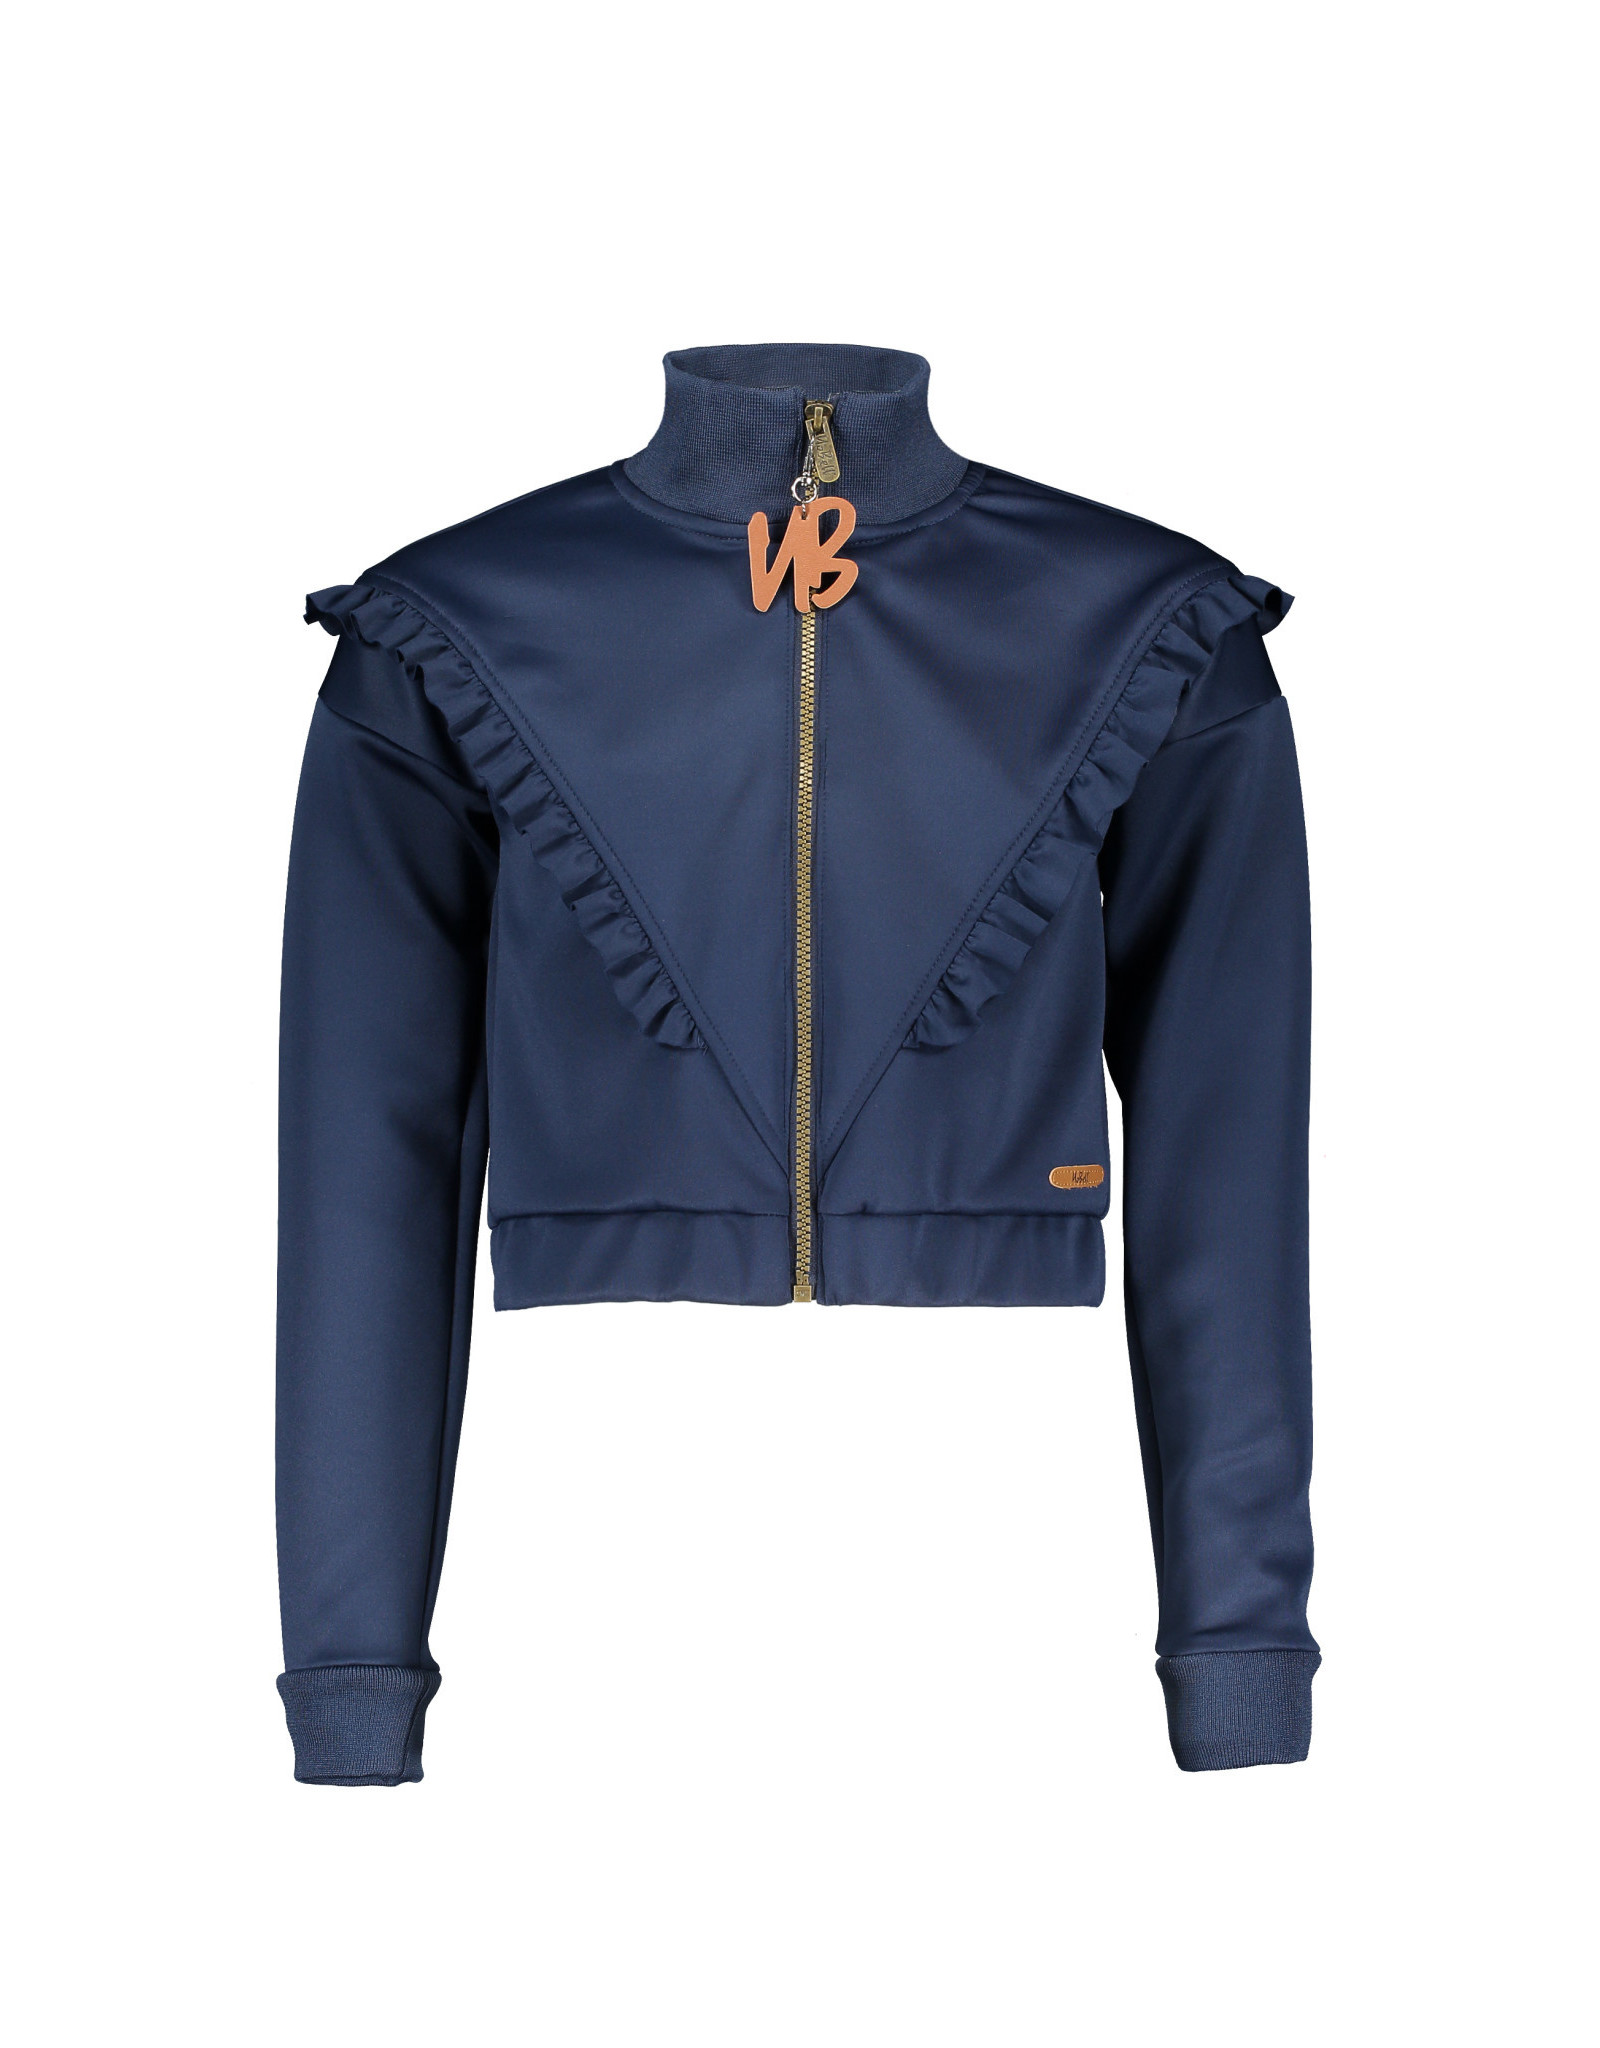 NoBell meiden cropped vest Dissy Grey Navy